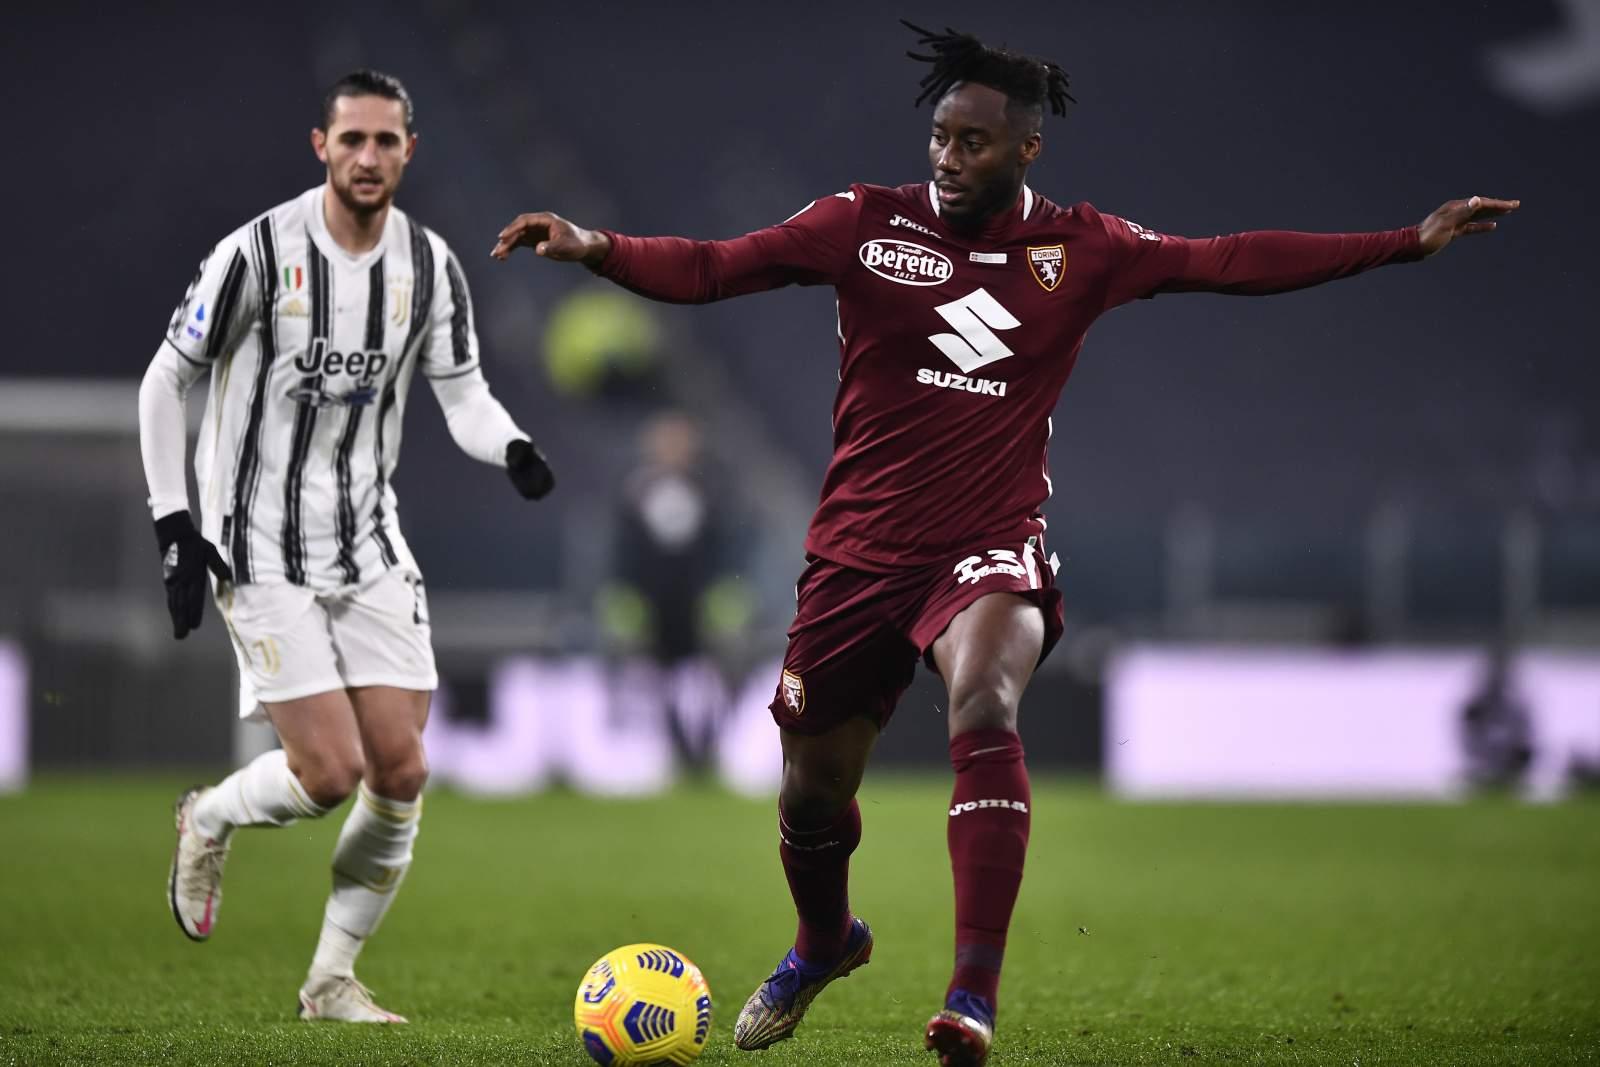 Мейте арендован «Миланом» до конца сезона